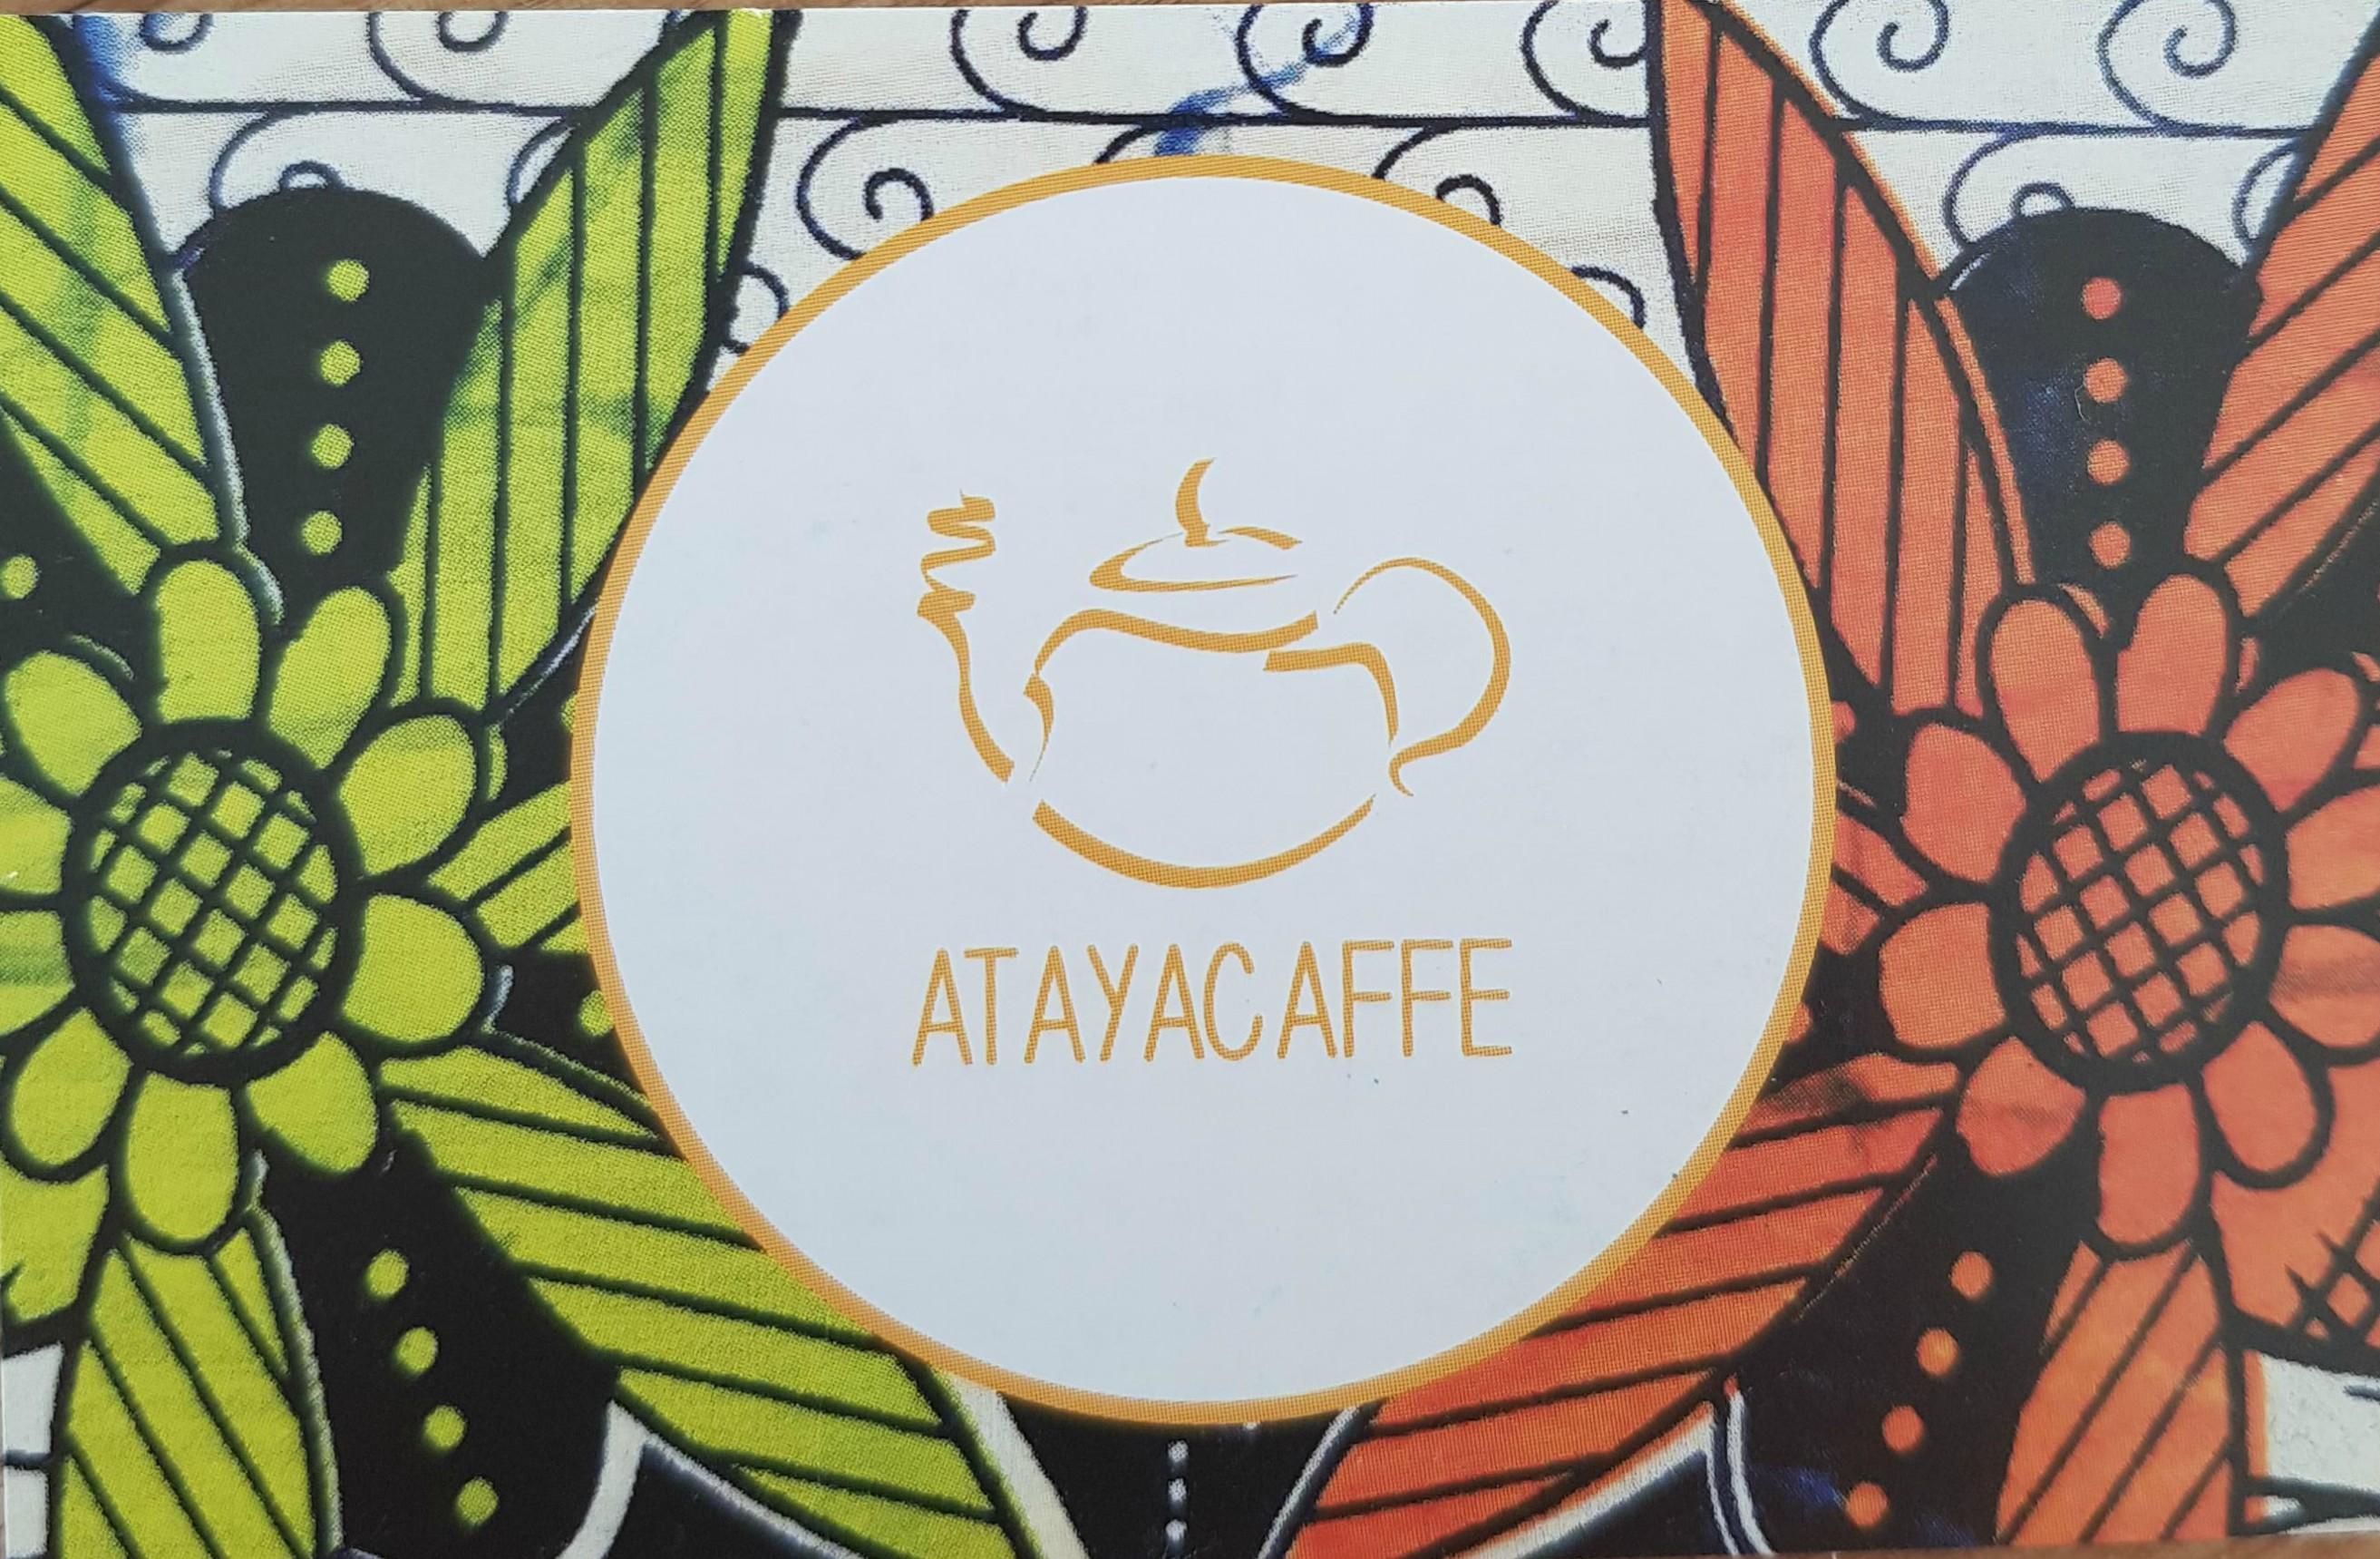 AtayaCaffe, Prenzlauer Berg, Berlin